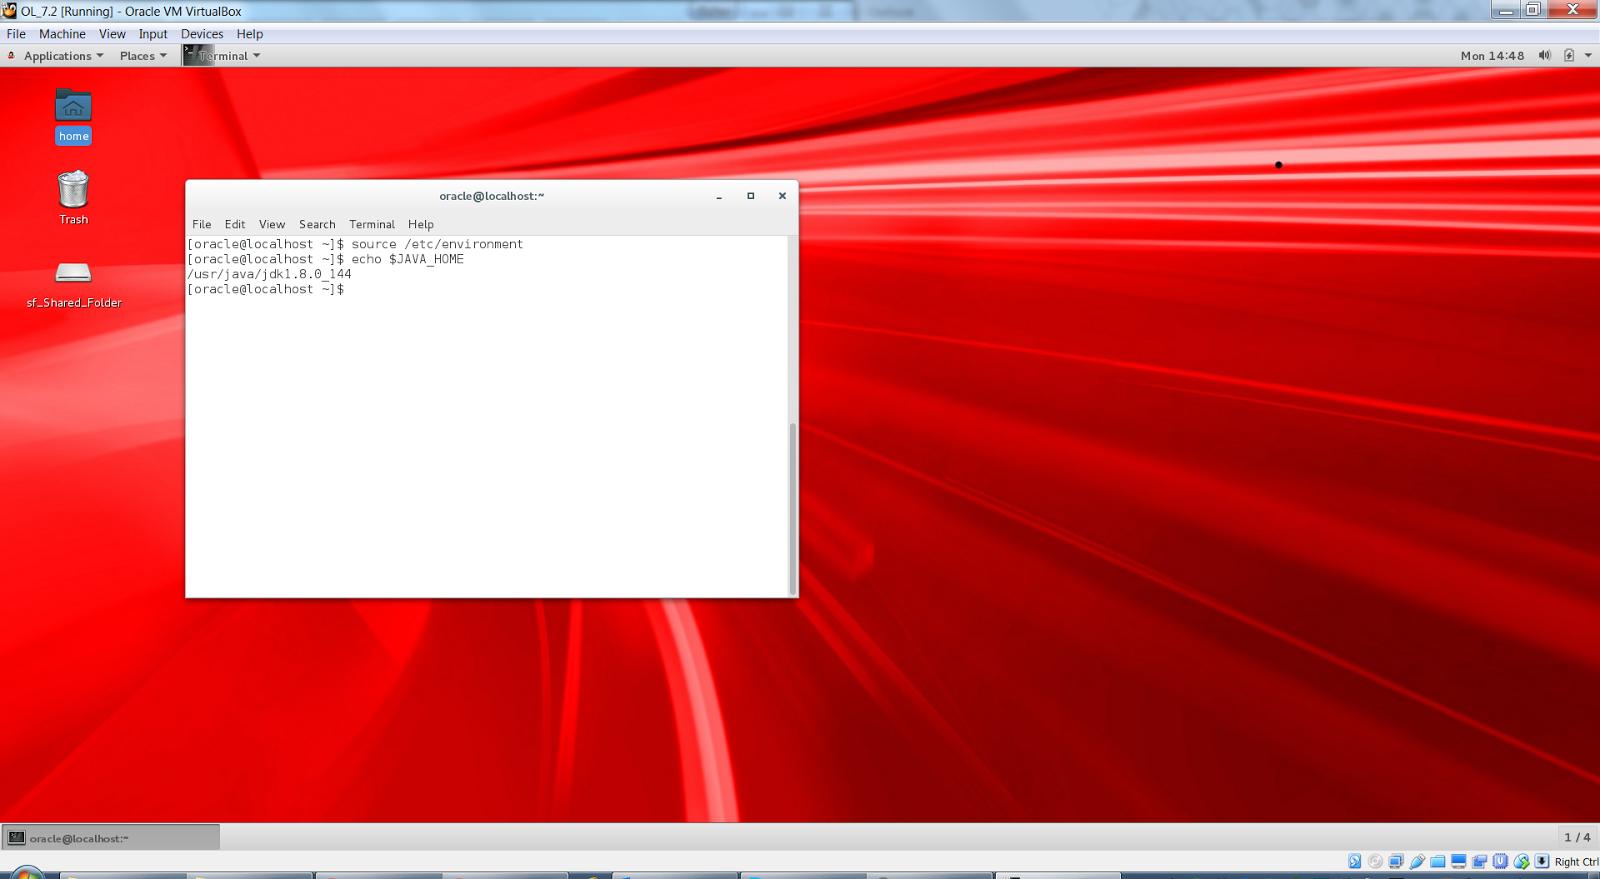 Java 8 Update 144